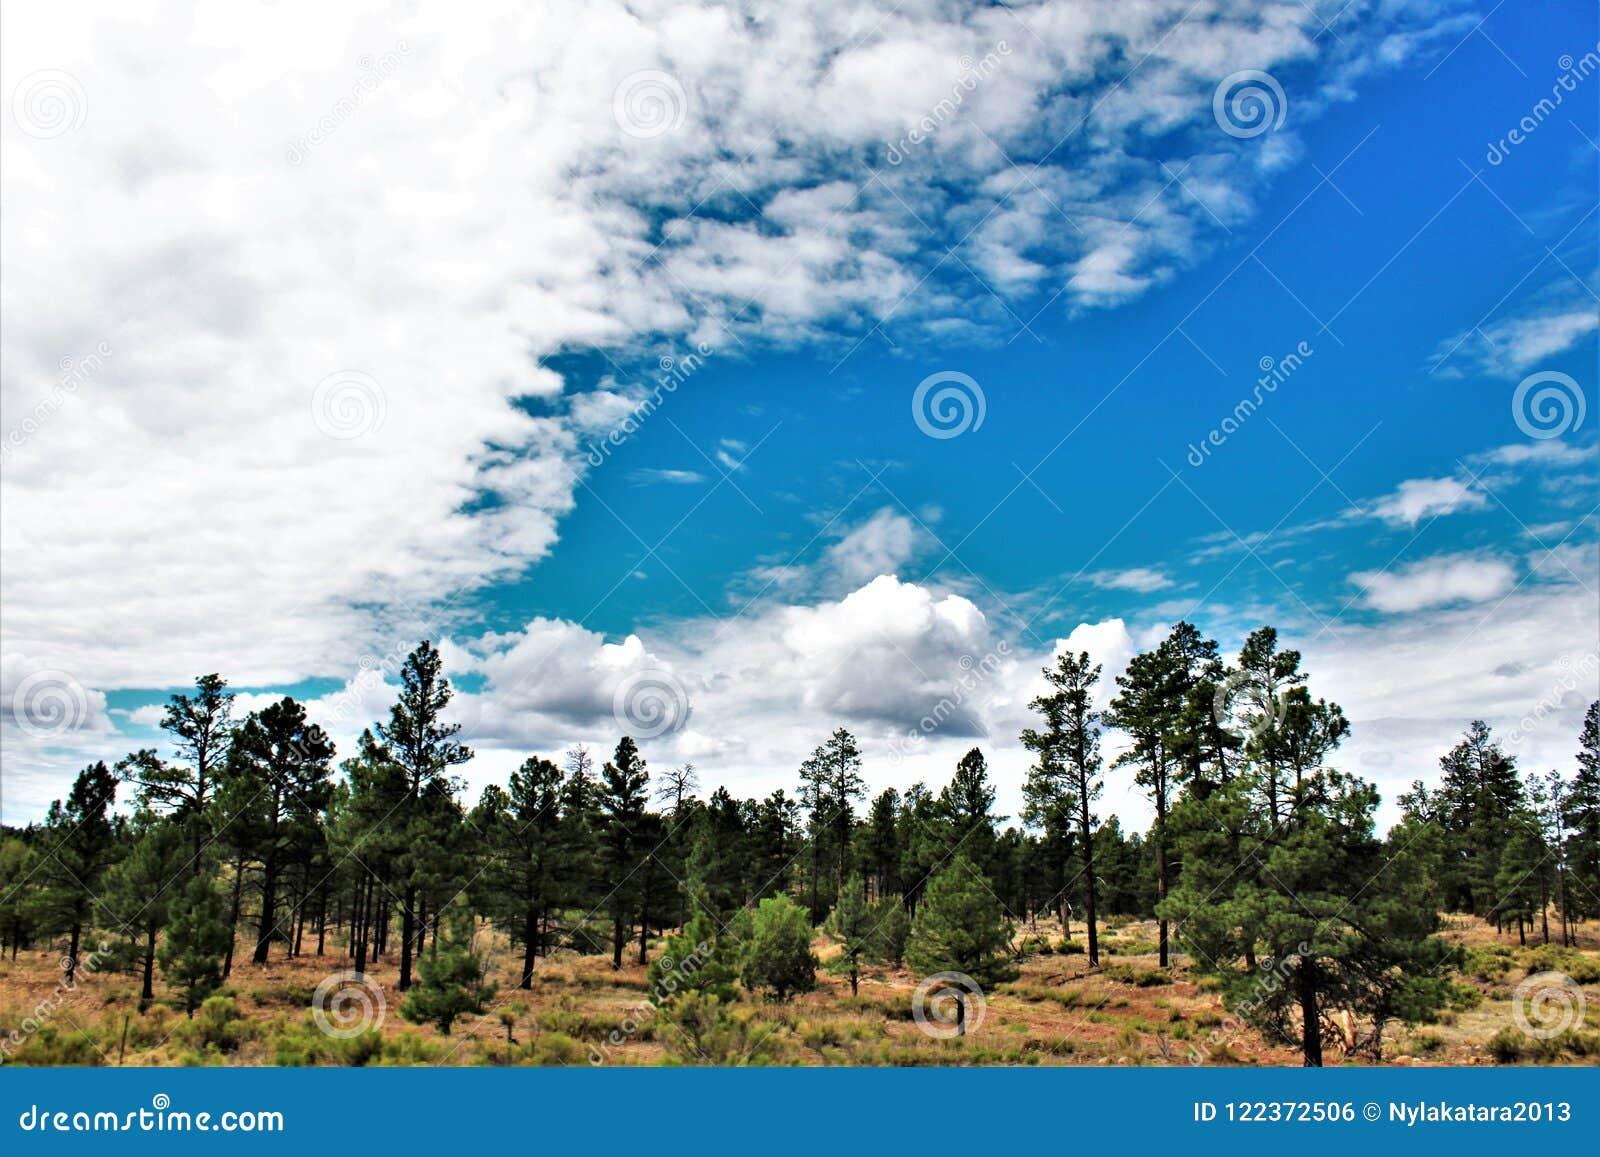 Heber Overgaard,纳瓦霍县, Sitgreaves国家森林,亚利桑那,美国